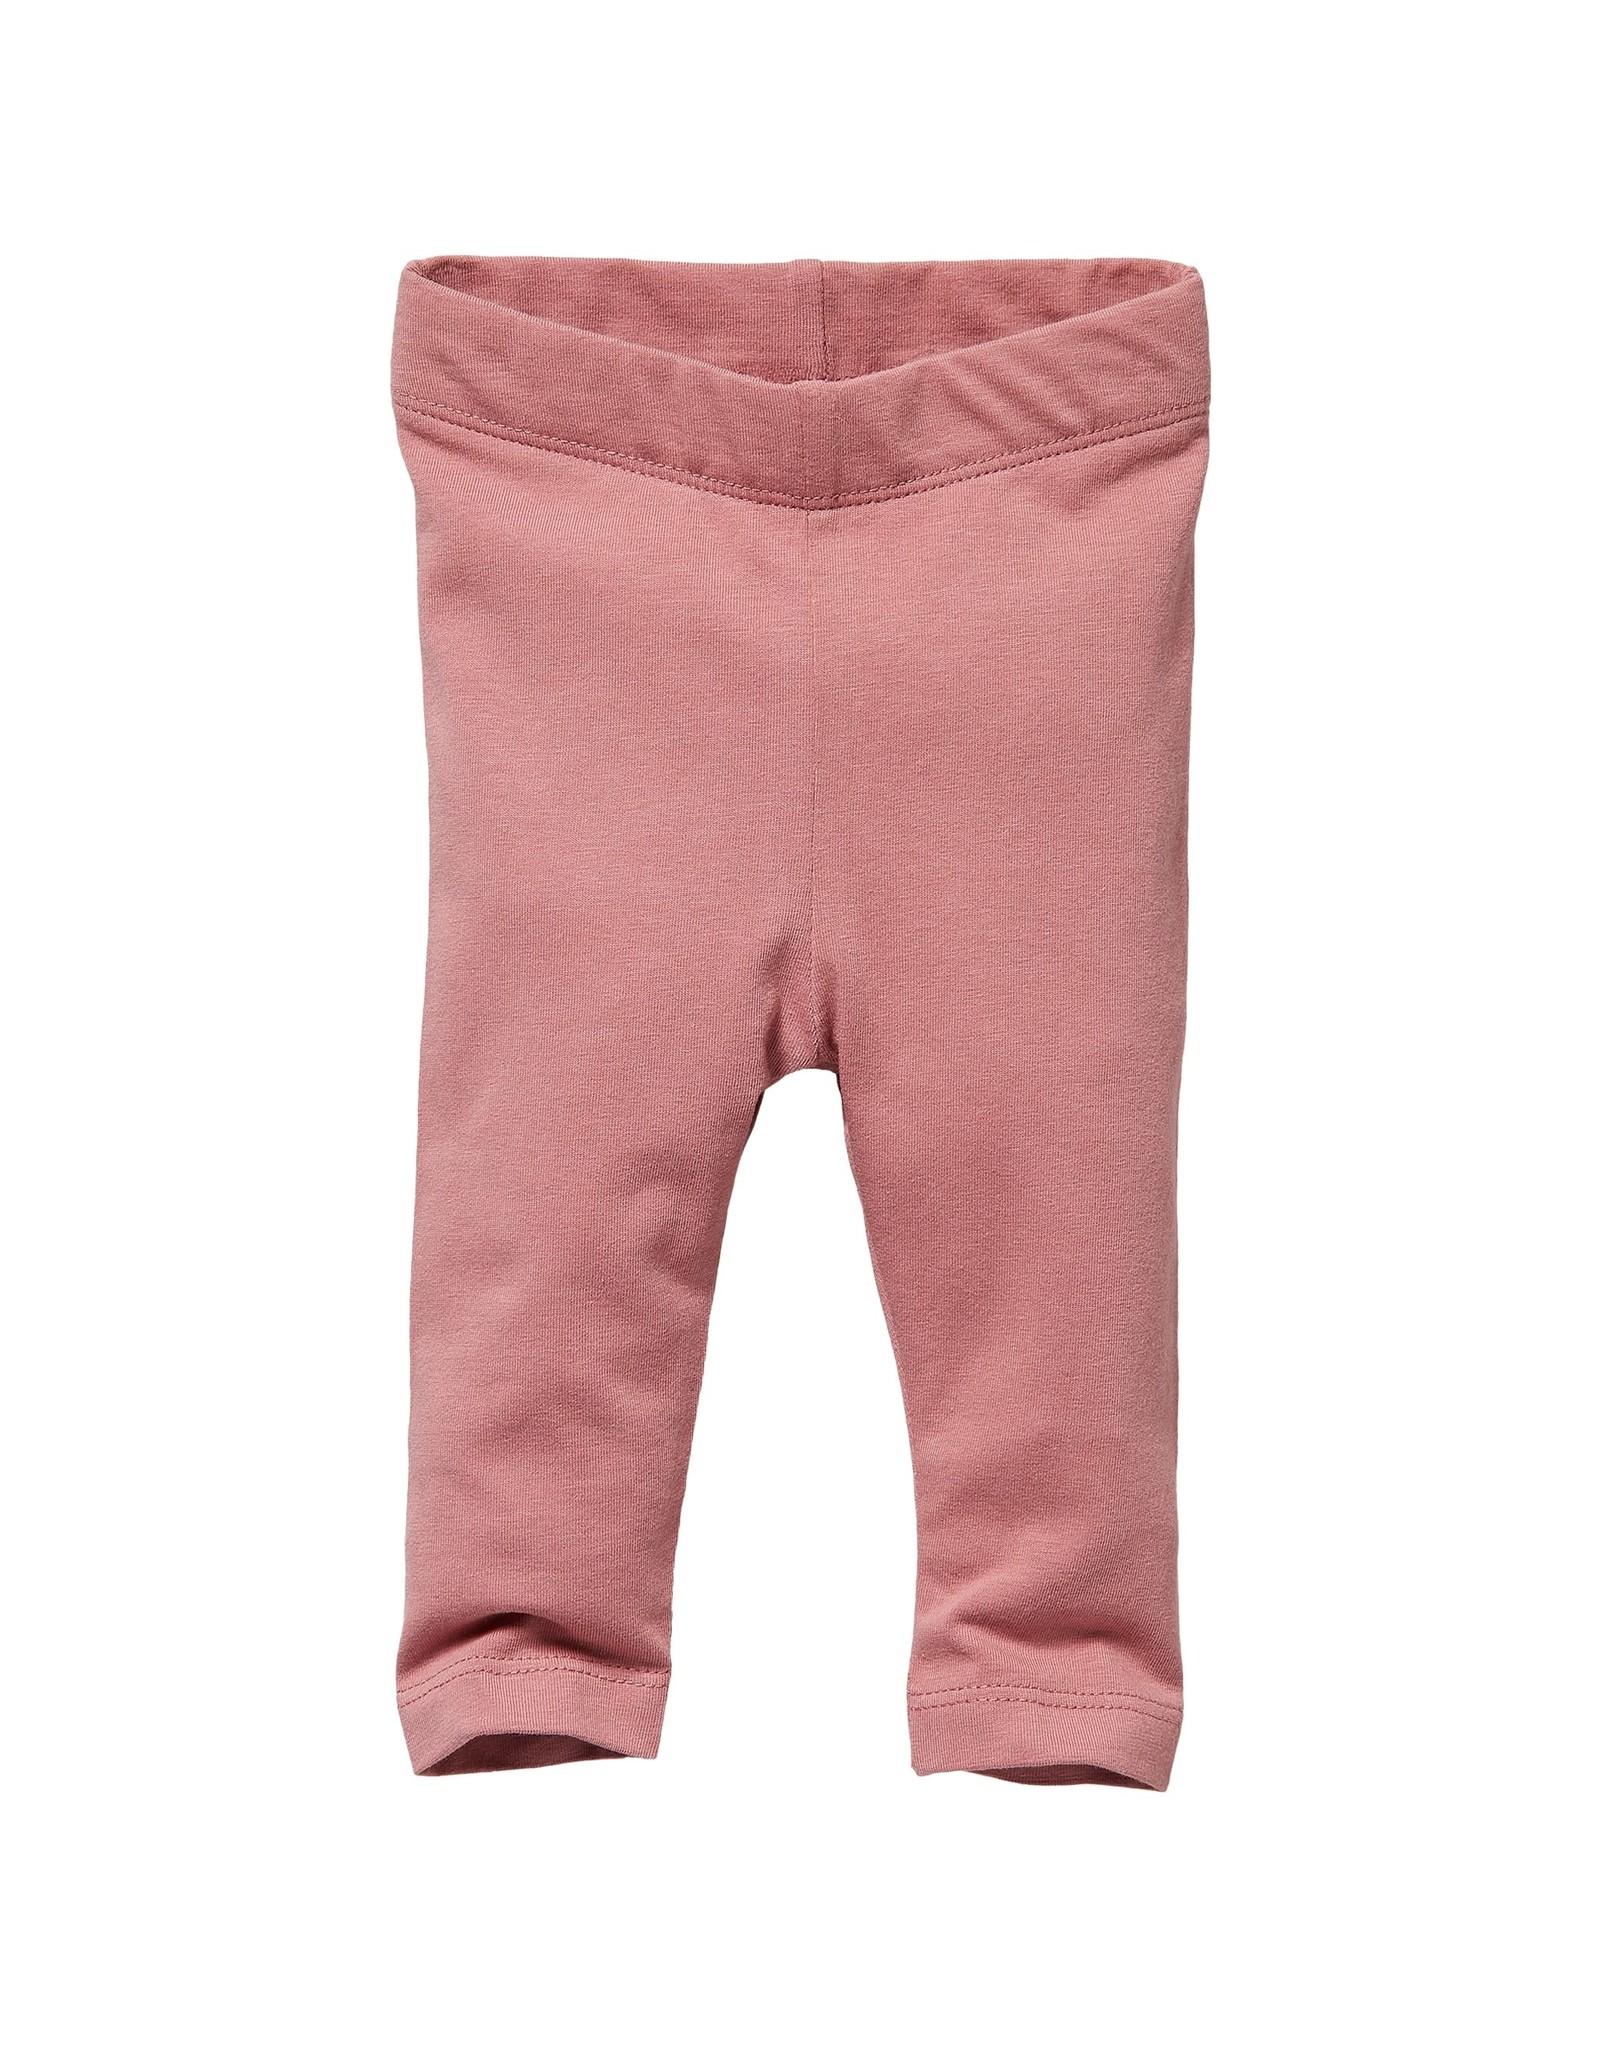 LEVV Levv Newborn meisjes legging Ziona Old Pink